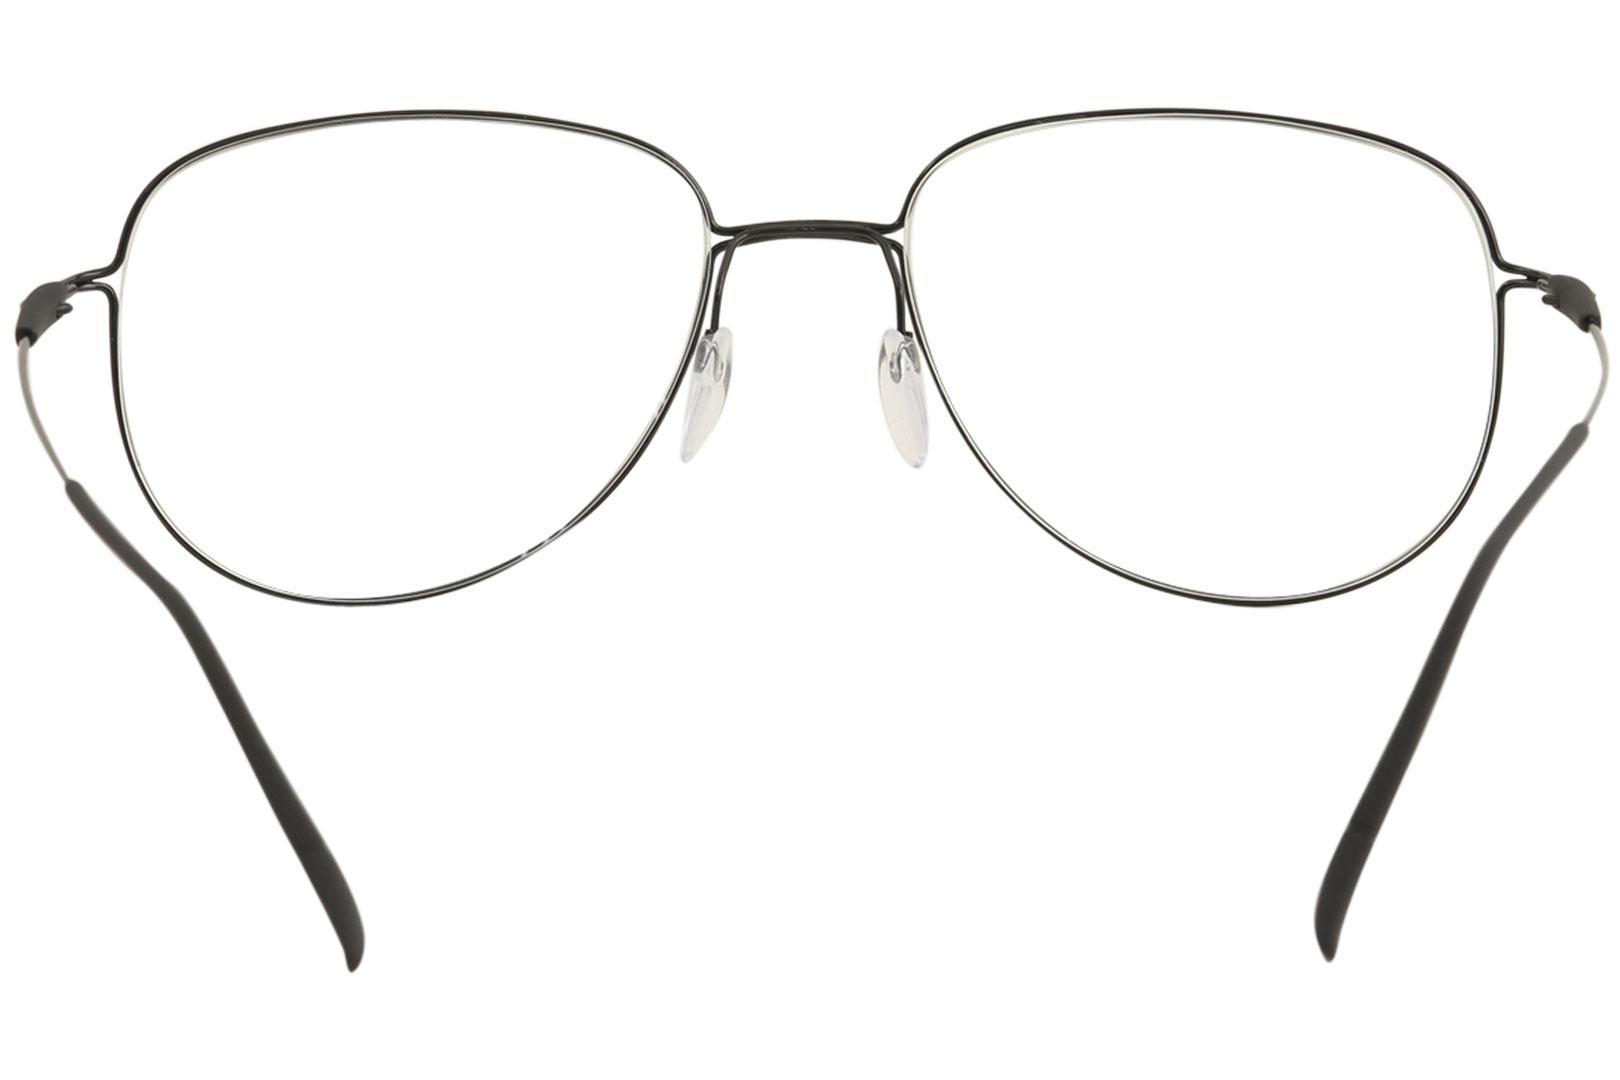 1a4438ceea3 Silhouette Eyeglasses Dynamics Colorwave Fullrim 5507 Optical Frame